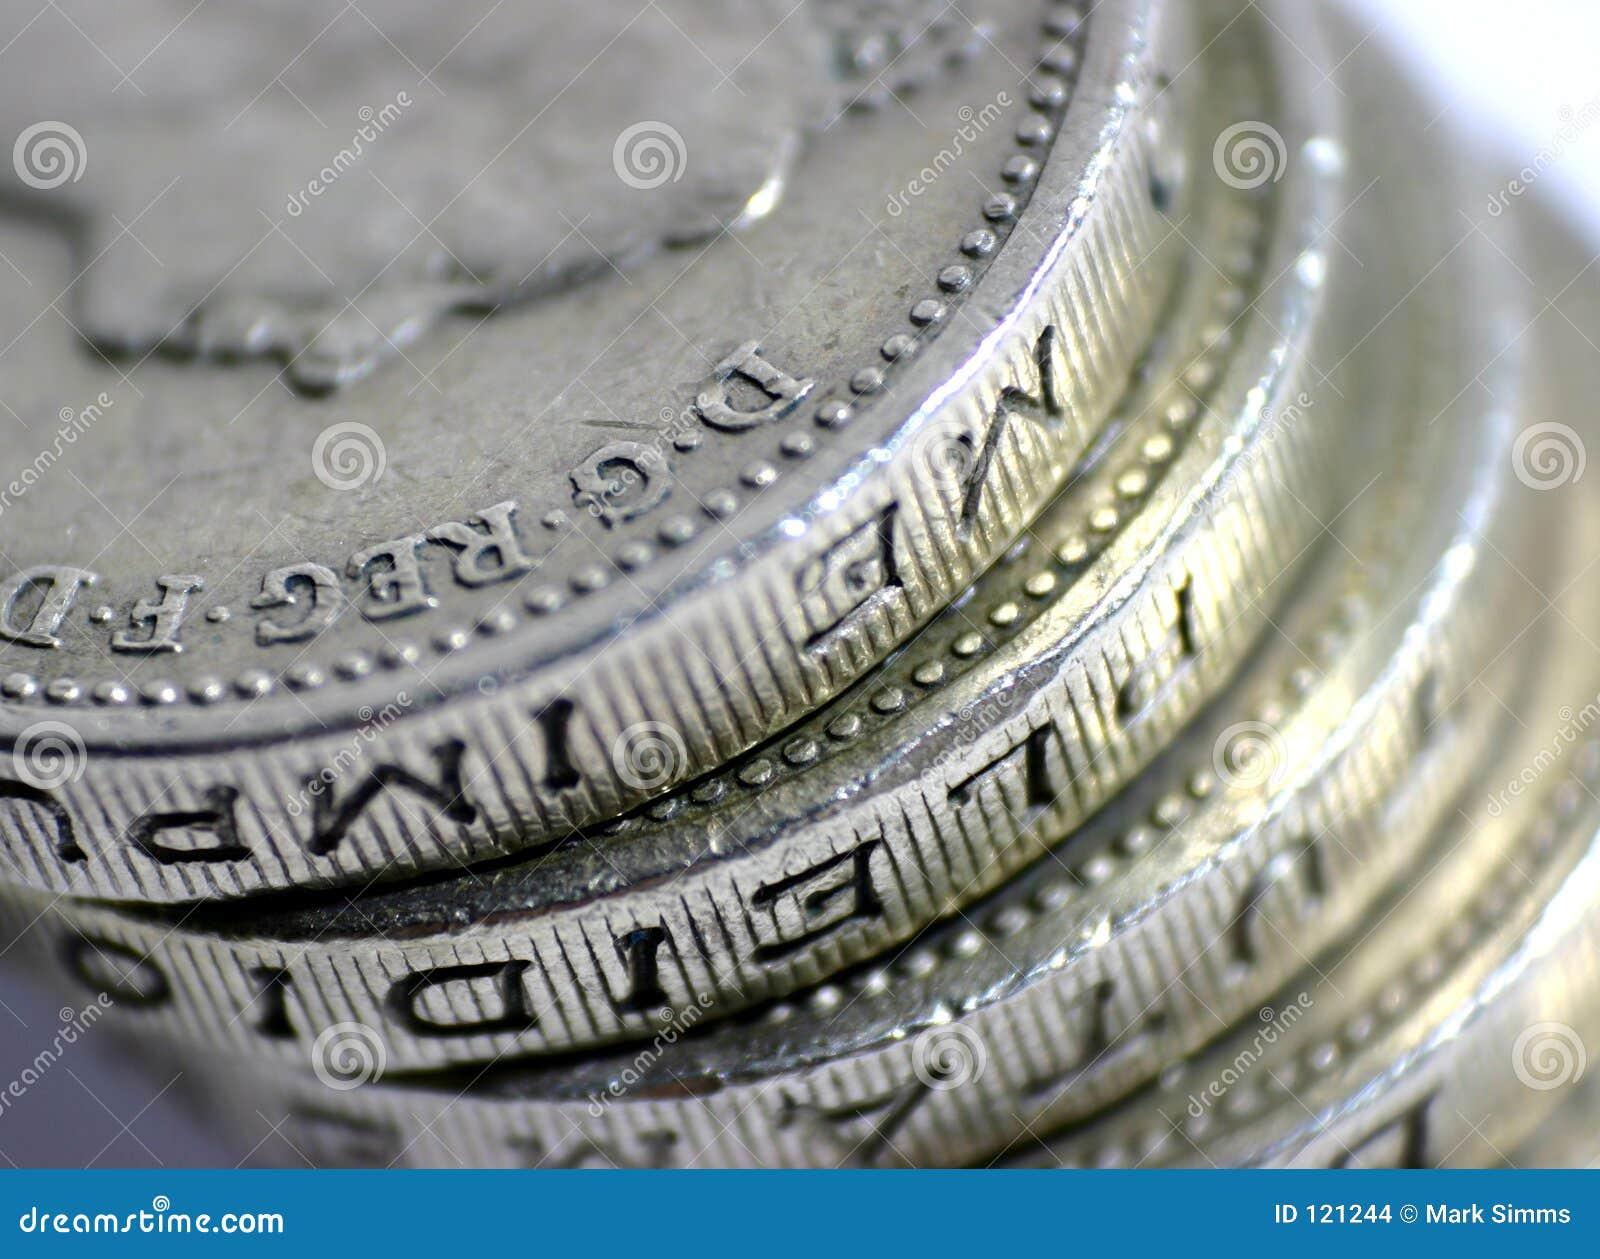 Download στοίβες χρημάτων στοκ εικόνες. εικόνα από ουρές, χρήματα - 121244